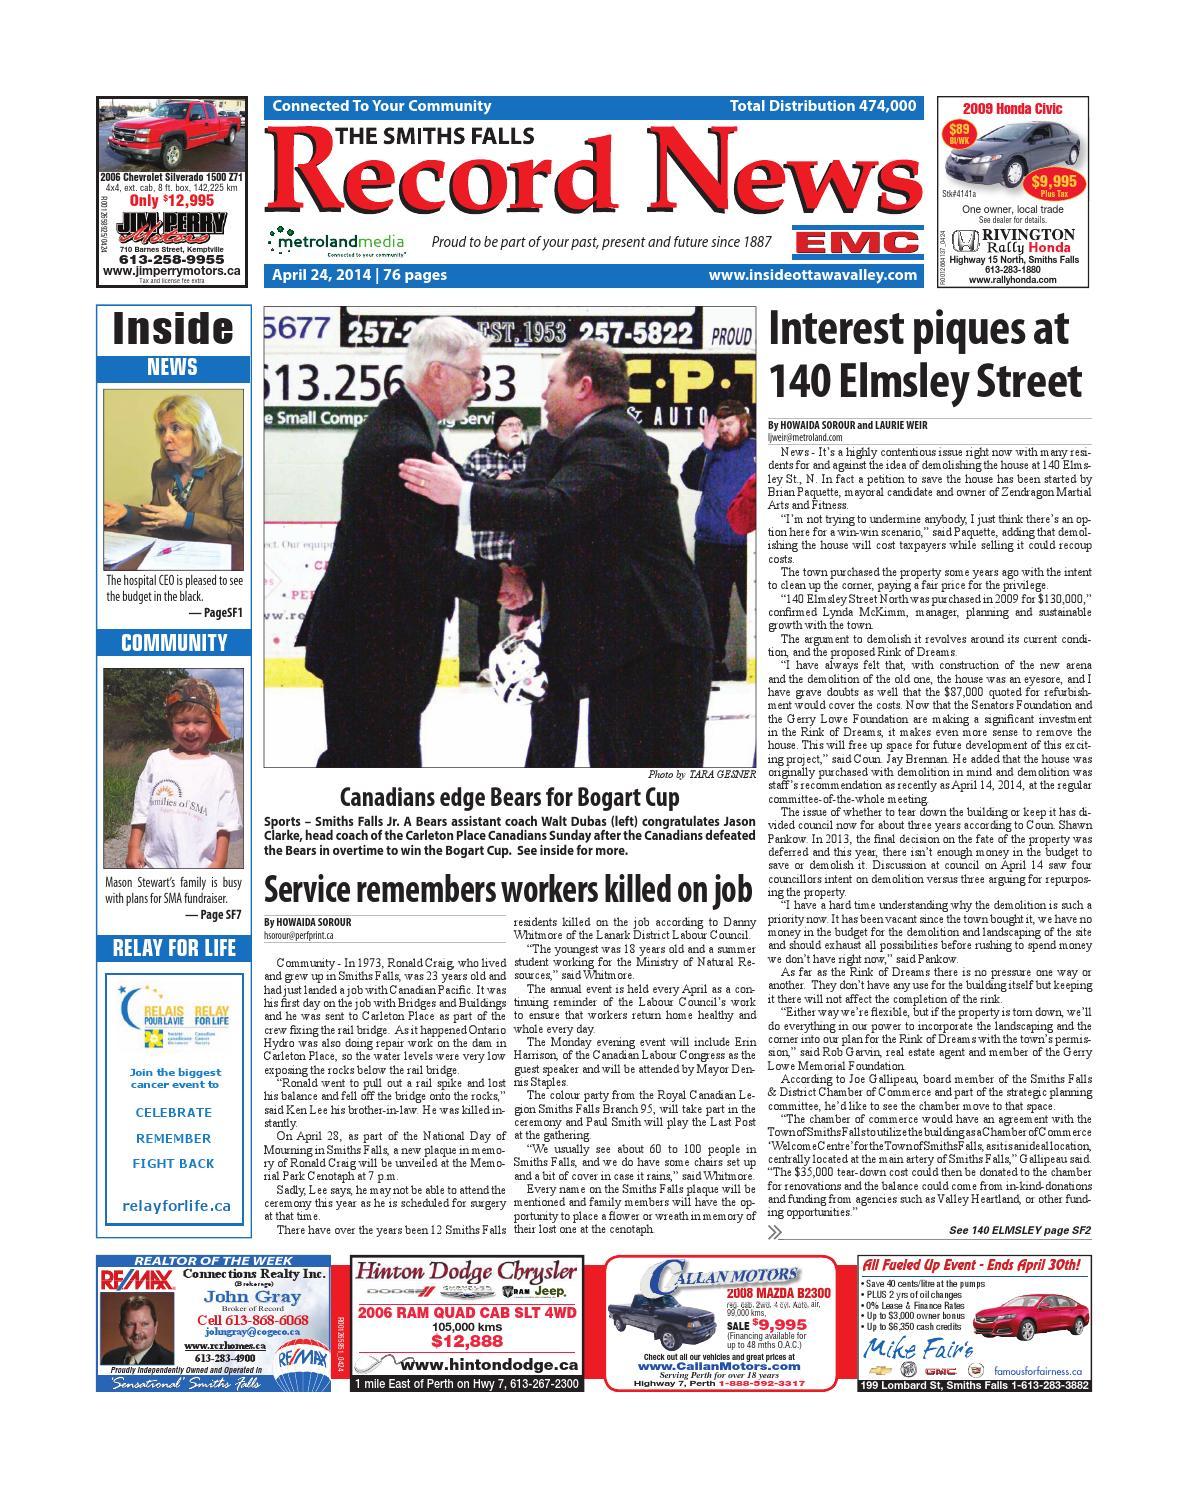 361e86cb990e Smithsfalls042414 by Metroland East - Smiths Falls Record News - issuu